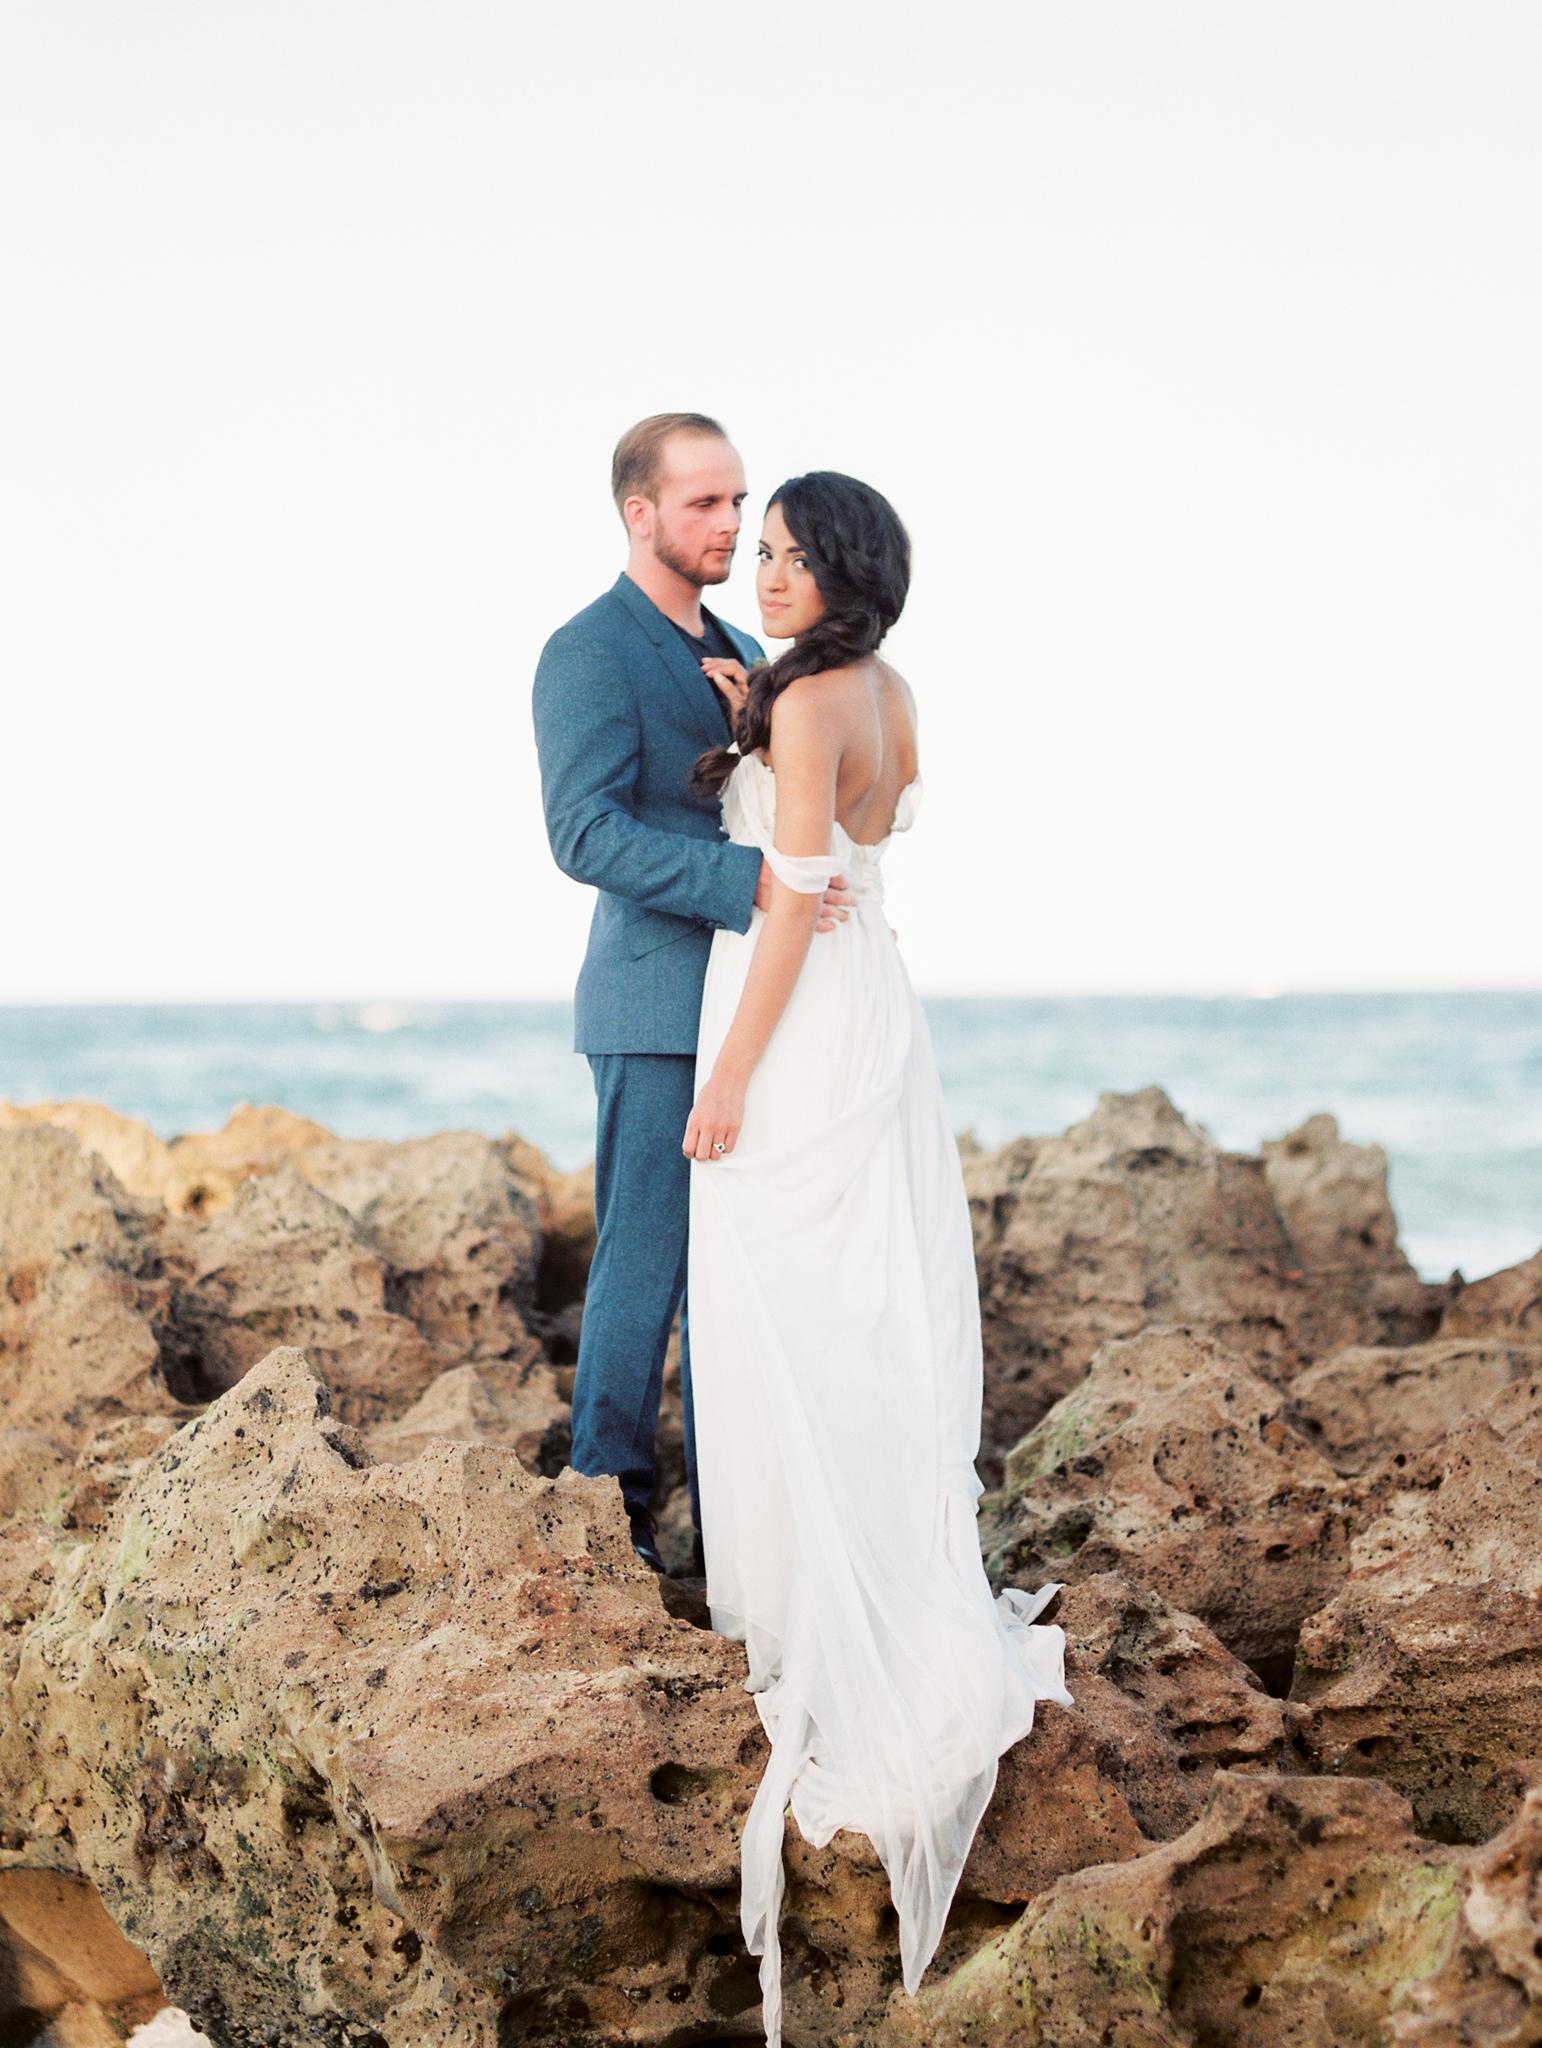 coral cove, jupiter beach FL, palm beach wedding photos, bride and groom photos